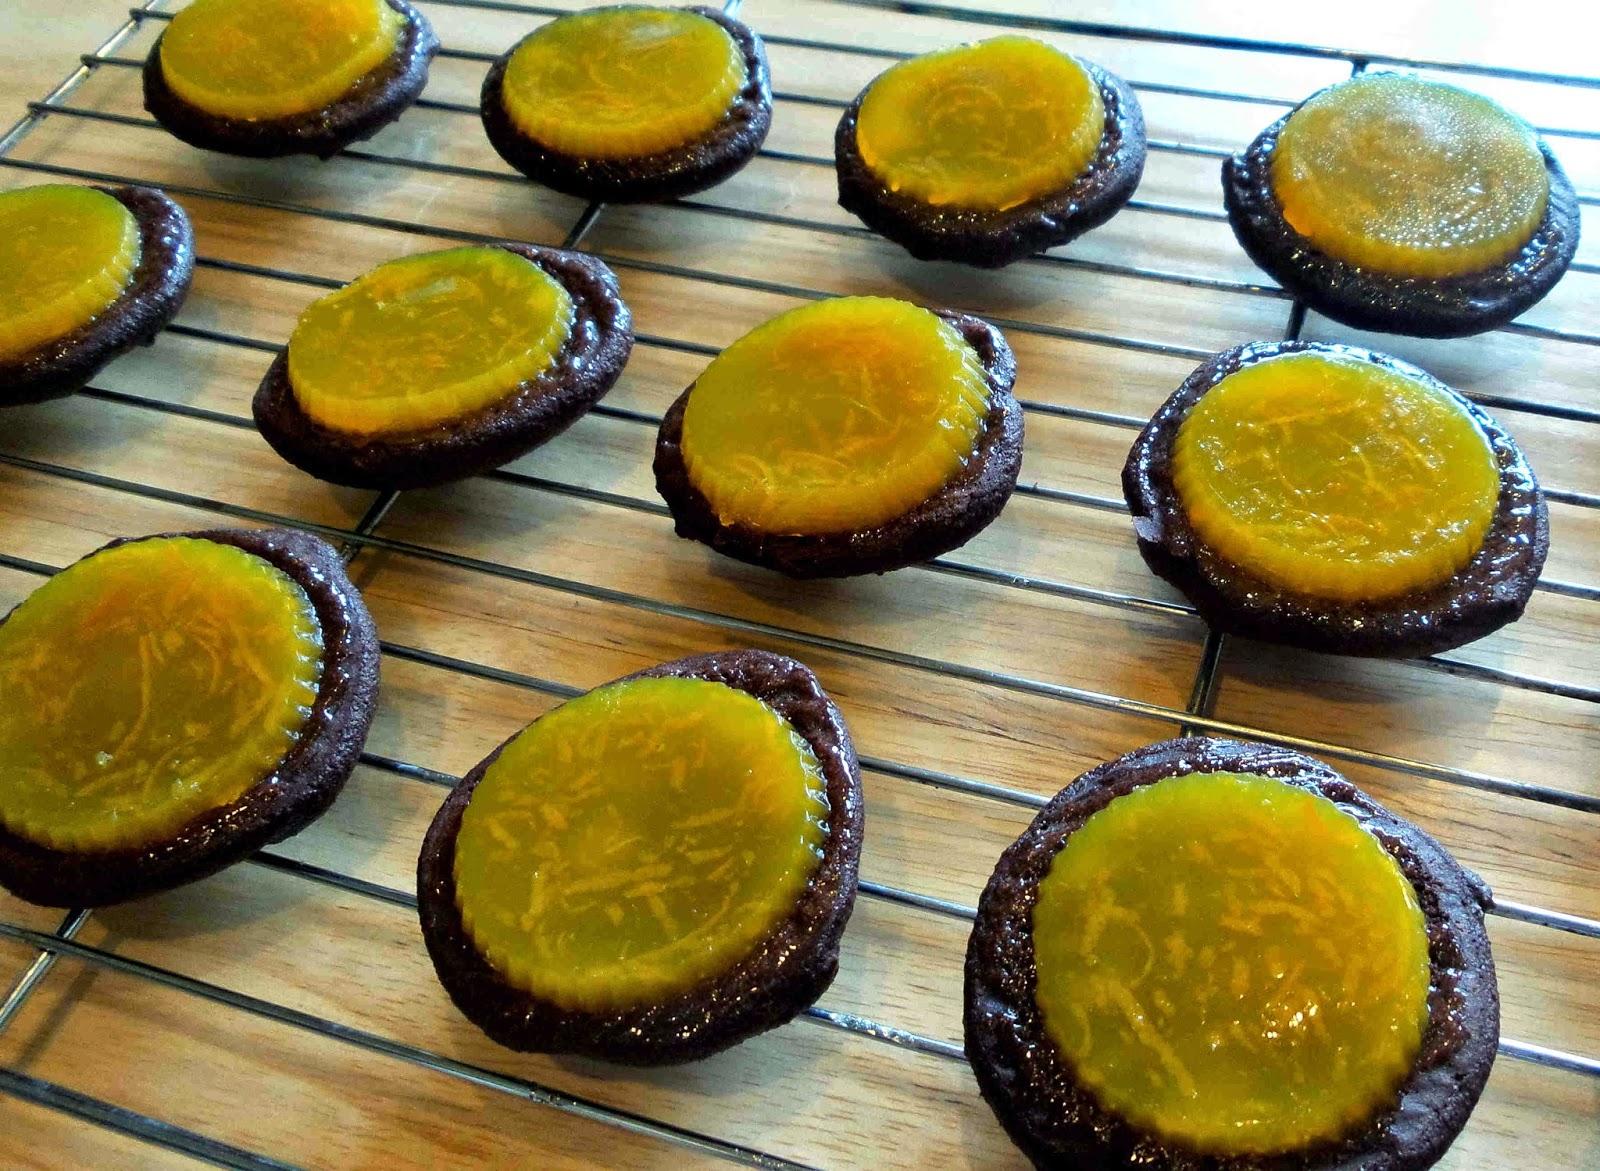 Are Jaffa Cakes Nut Free